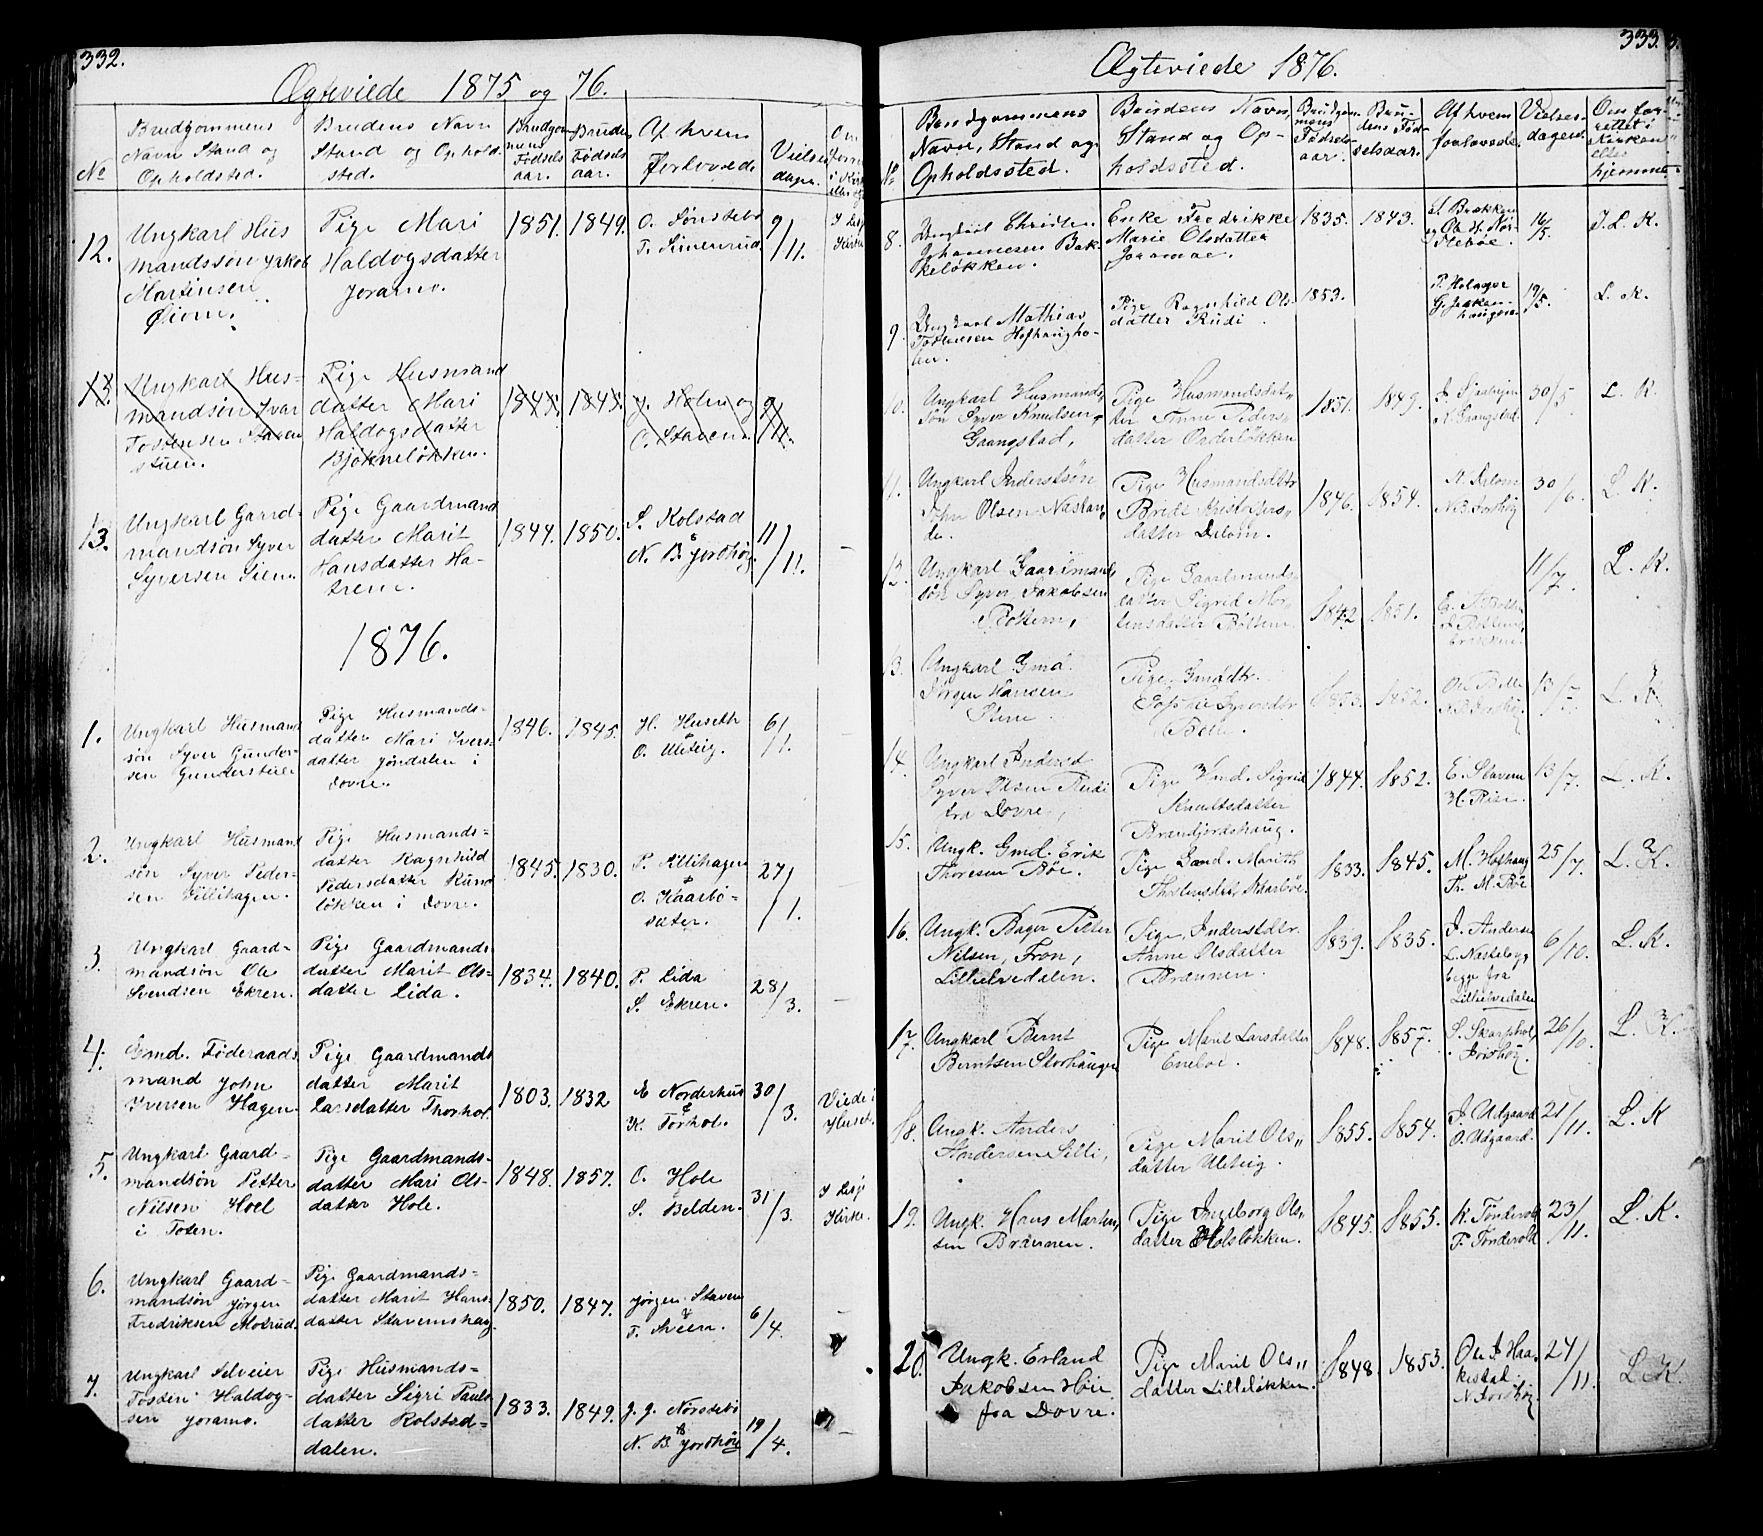 SAH, Lesja prestekontor, Klokkerbok nr. 5, 1850-1894, s. 332-333